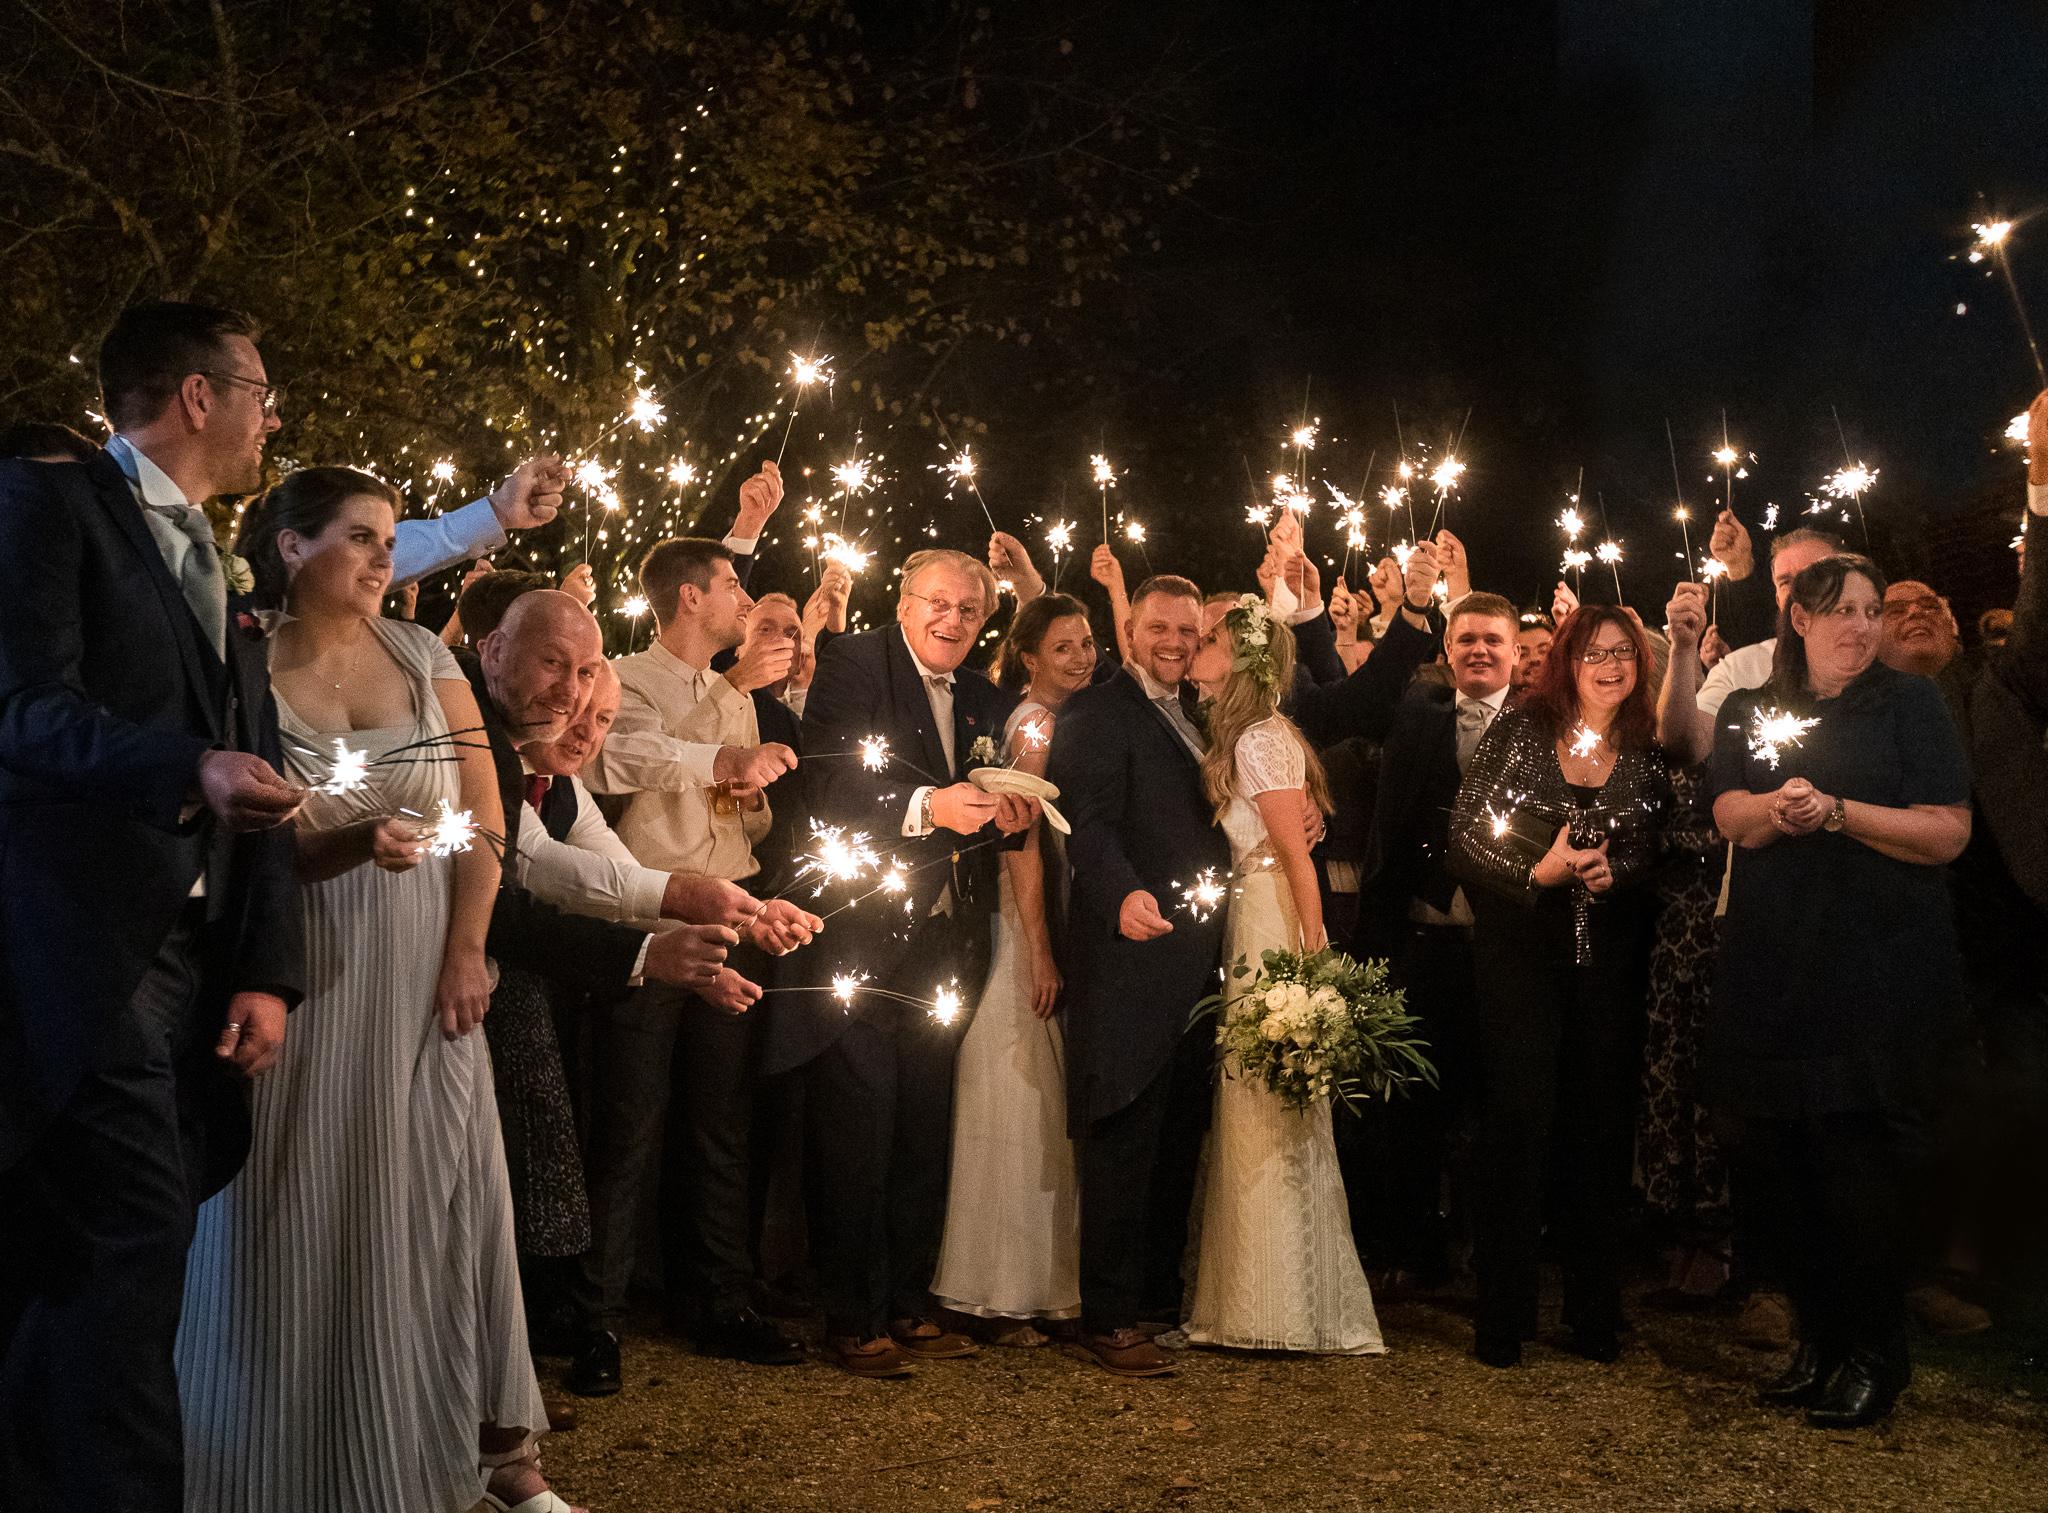 Hampshire_wedding_photography_sparkler_exit_Rachel_Thornhill_Photographer